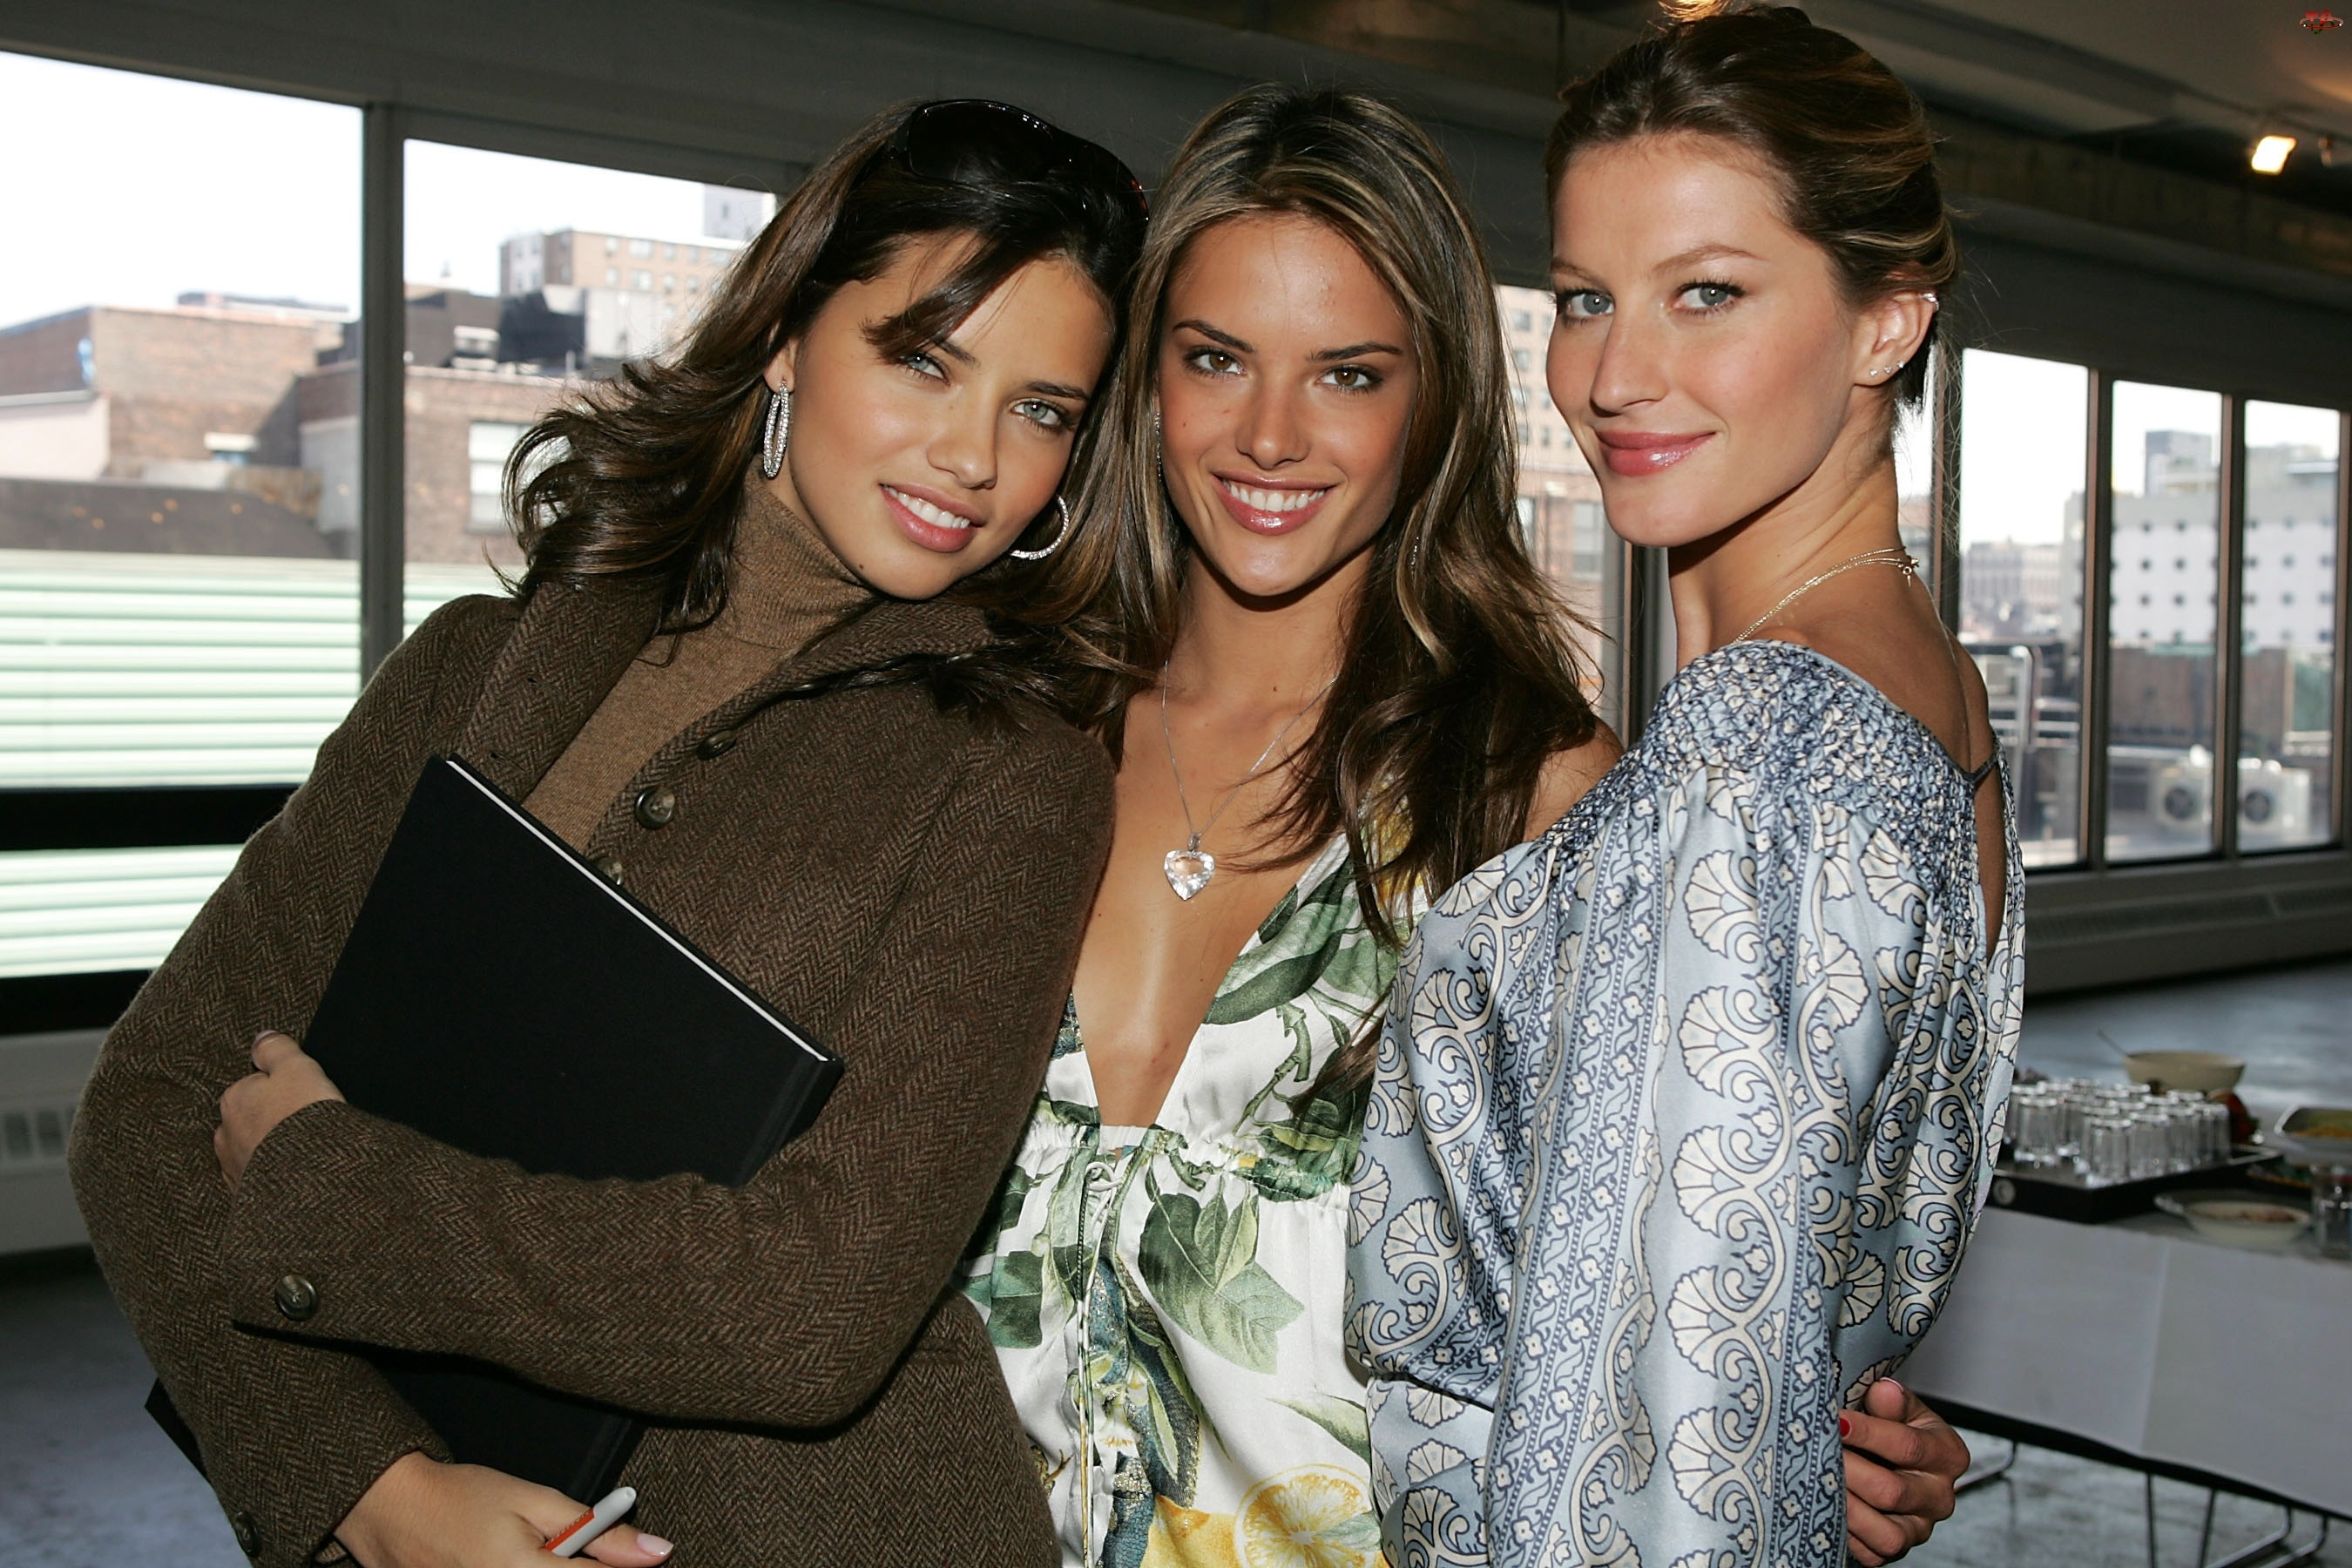 Modelki, Adriana Lima, Gisele Bundchen, Heidi Klum